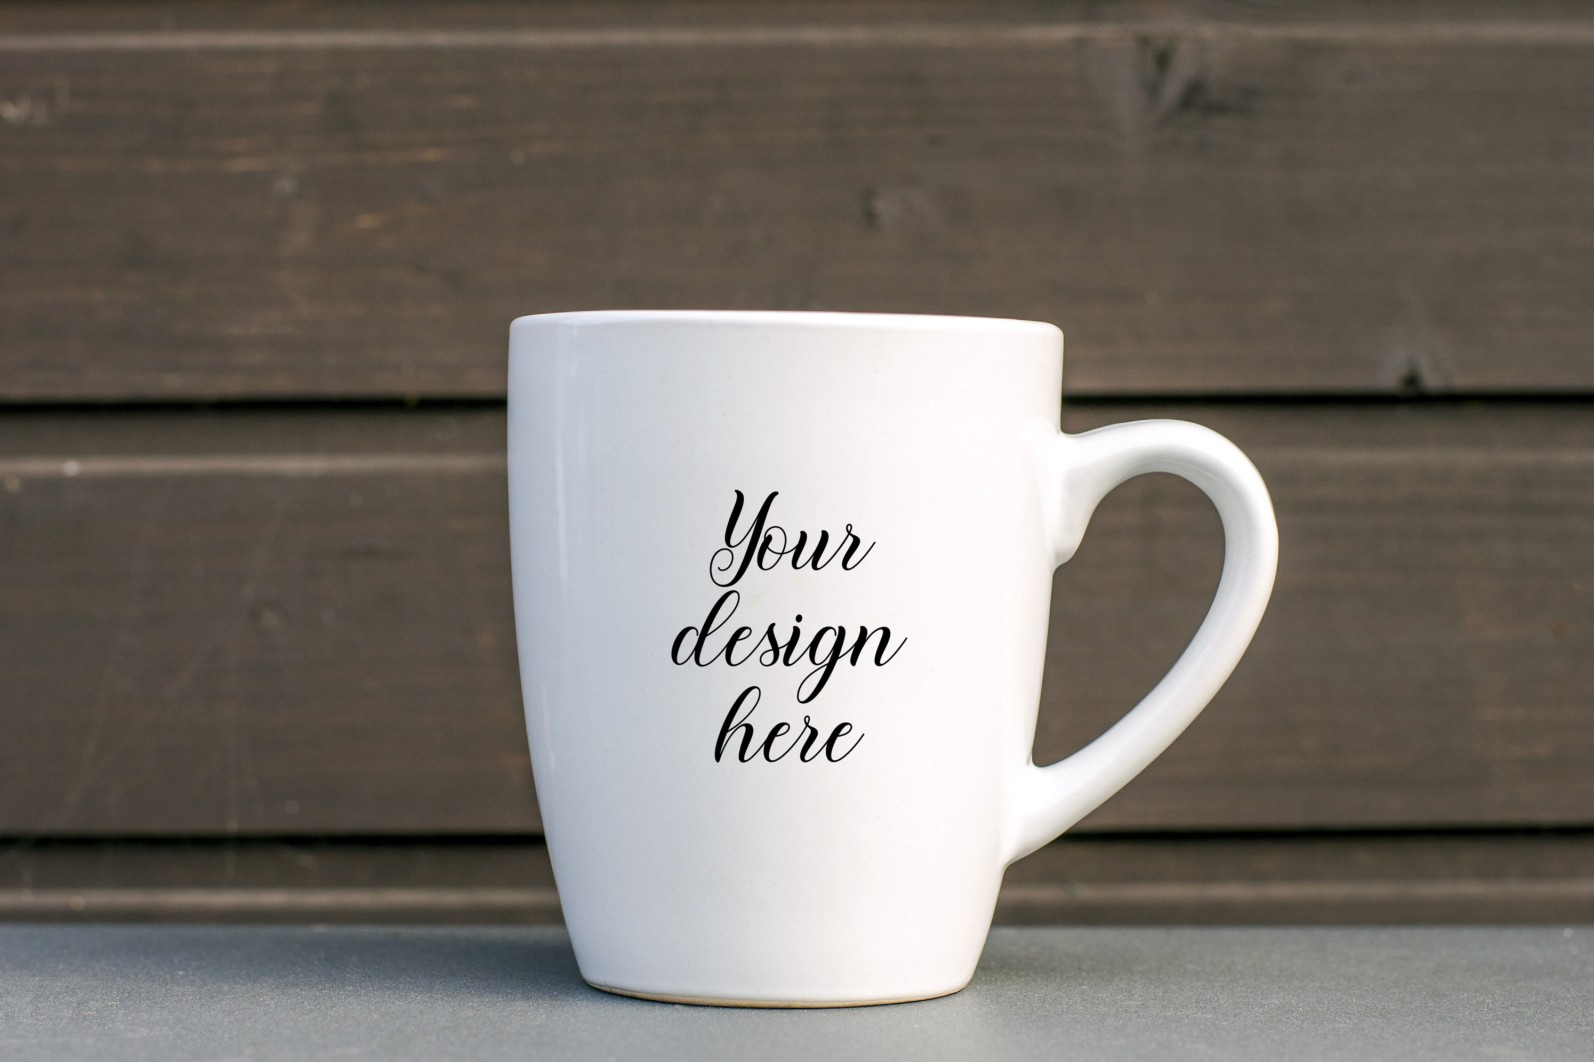 Coffee mug mockup bundle. Mug template bundle. PSD, JPEG files. - 12 1 1 scaled -